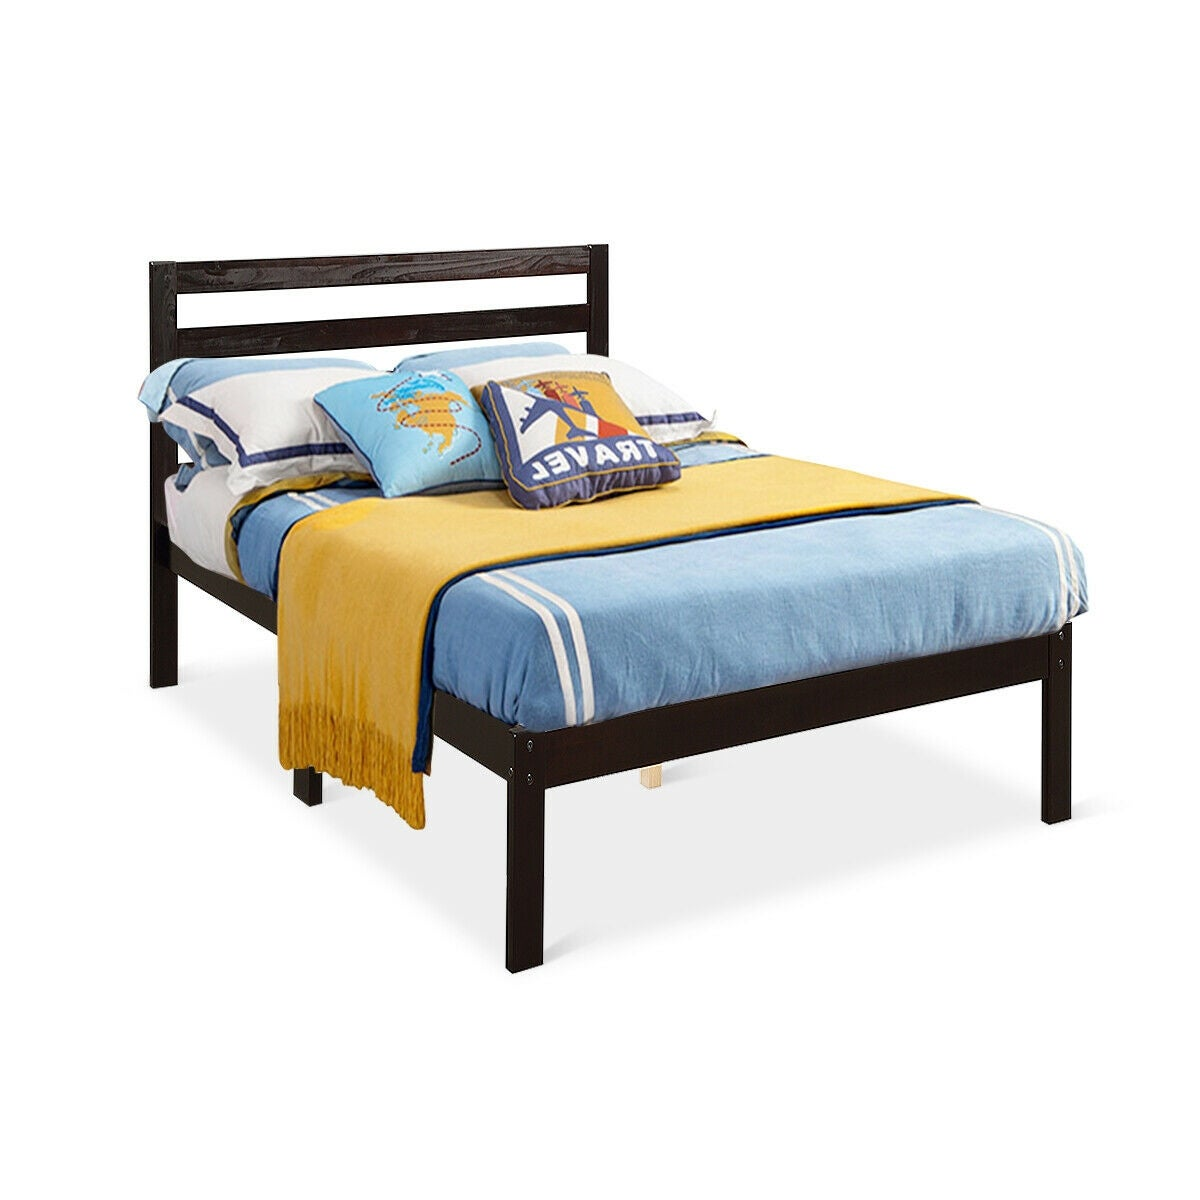 Gymax Solid Wood Platform Bed W